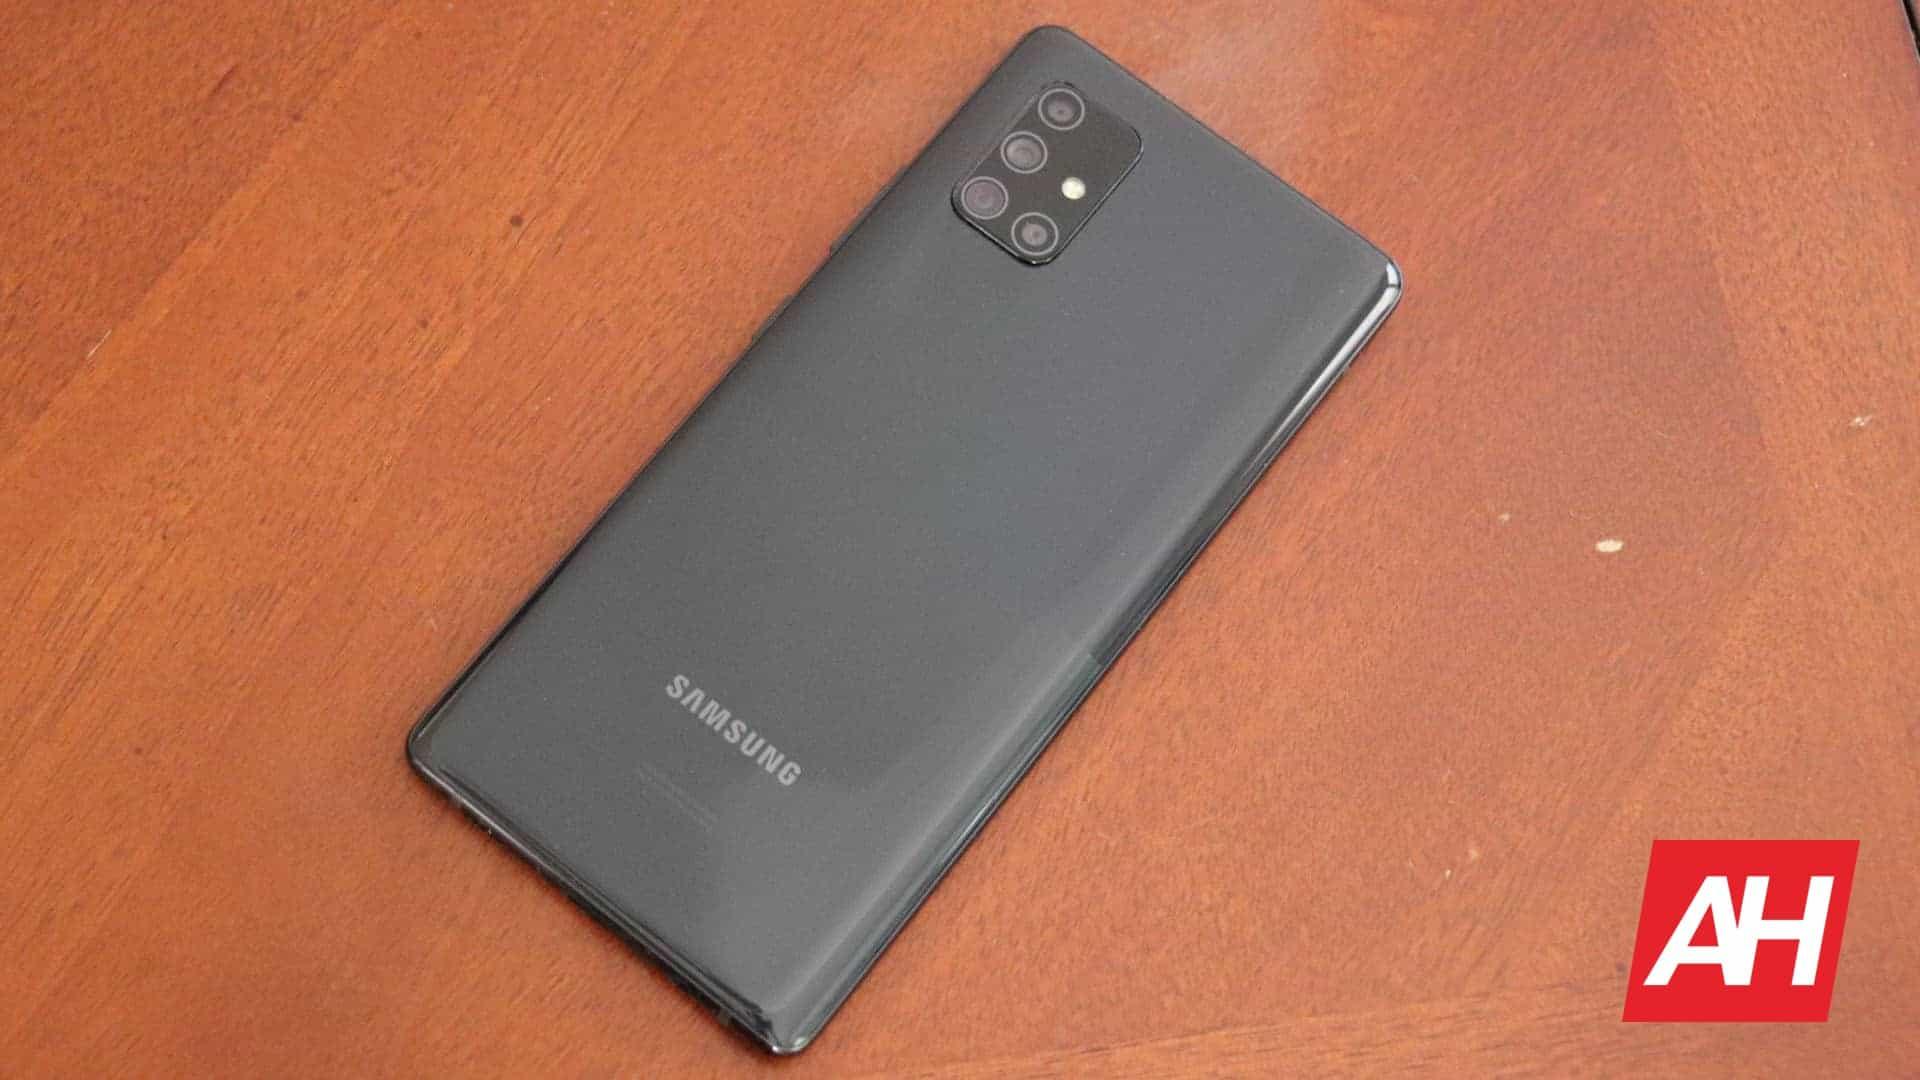 01 Samsung Galaxy A71 5G Hardware Review AH 2020